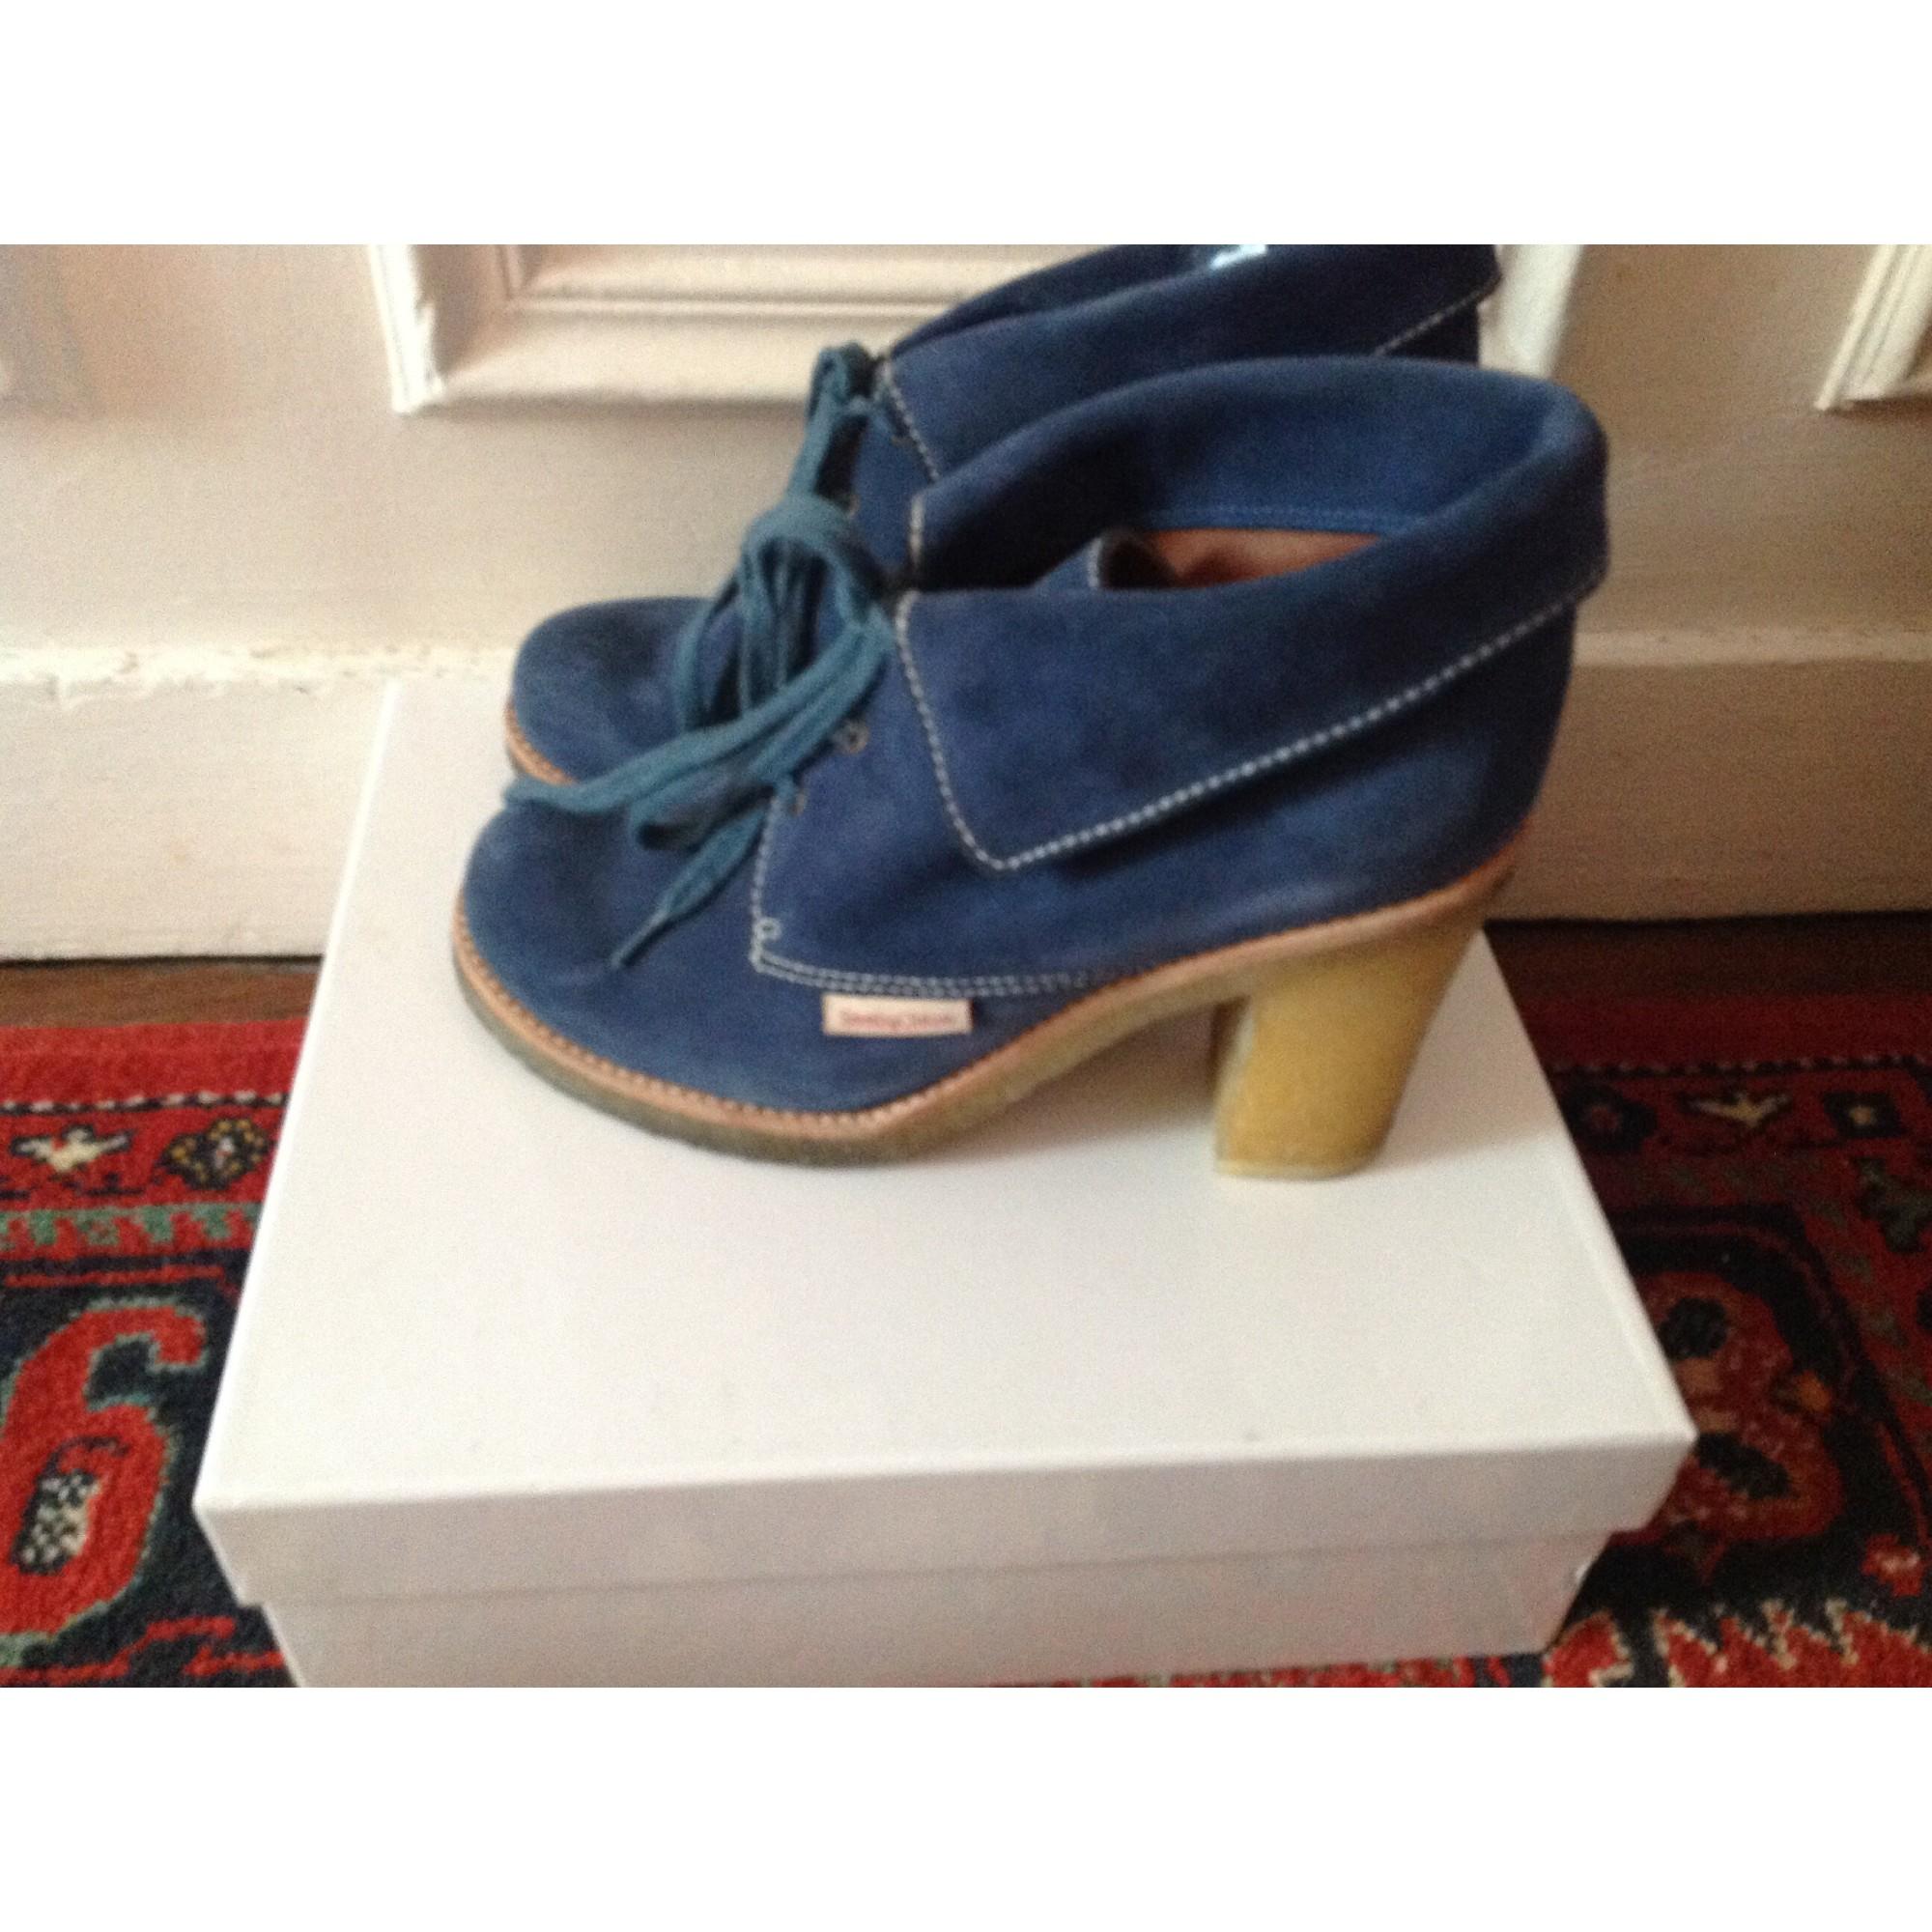 Bottines & low boots à talons SEE BY CHLOE Bleu, bleu marine, bleu turquoise